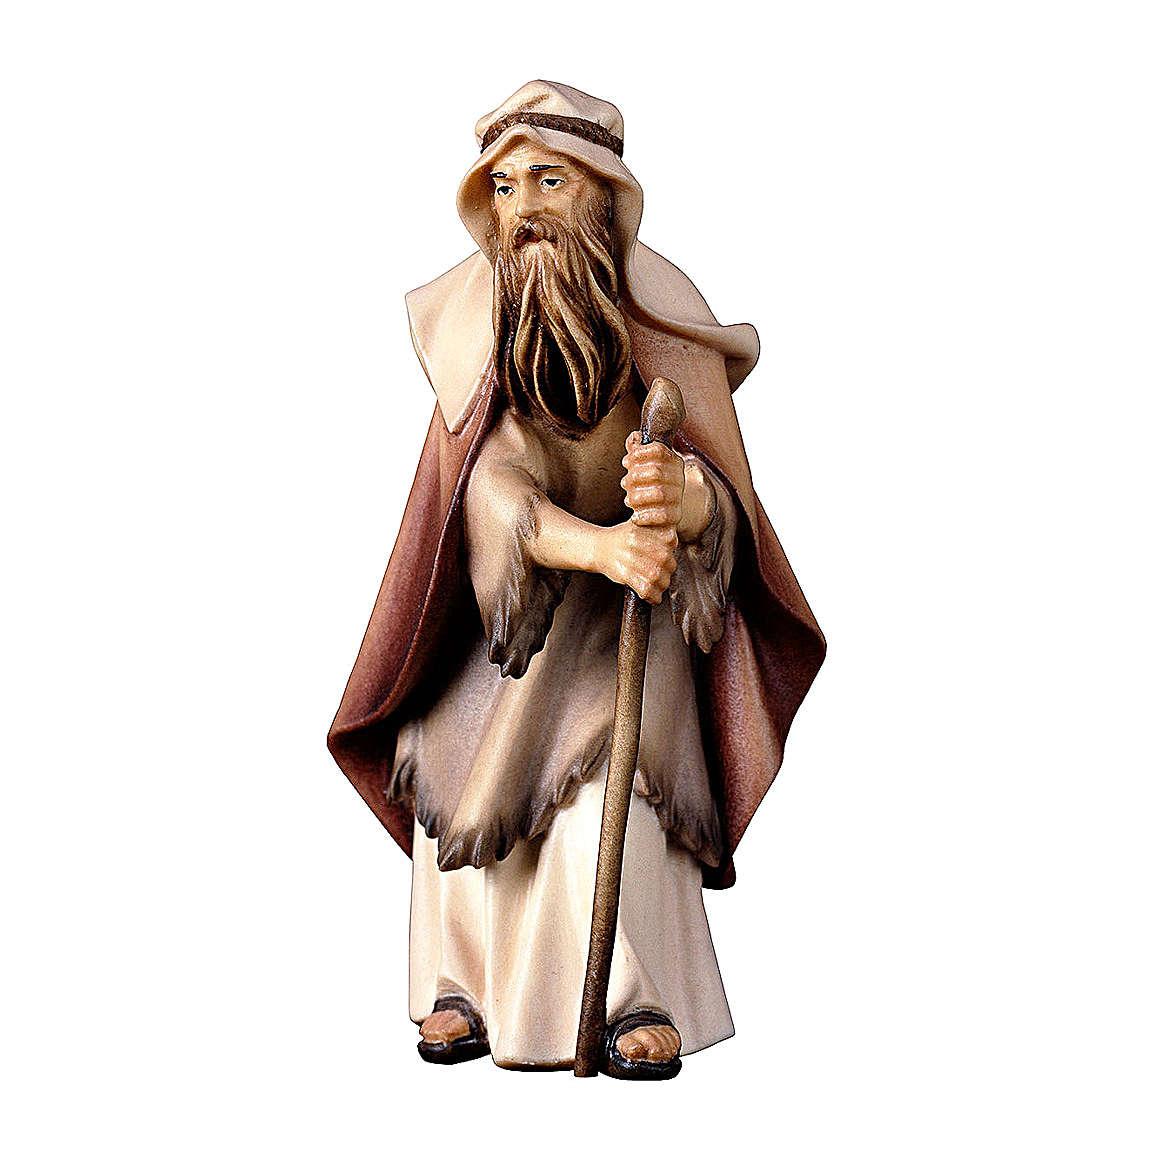 Anziano pastore con bastone presepe Original legno Valgardena 10 cm 4